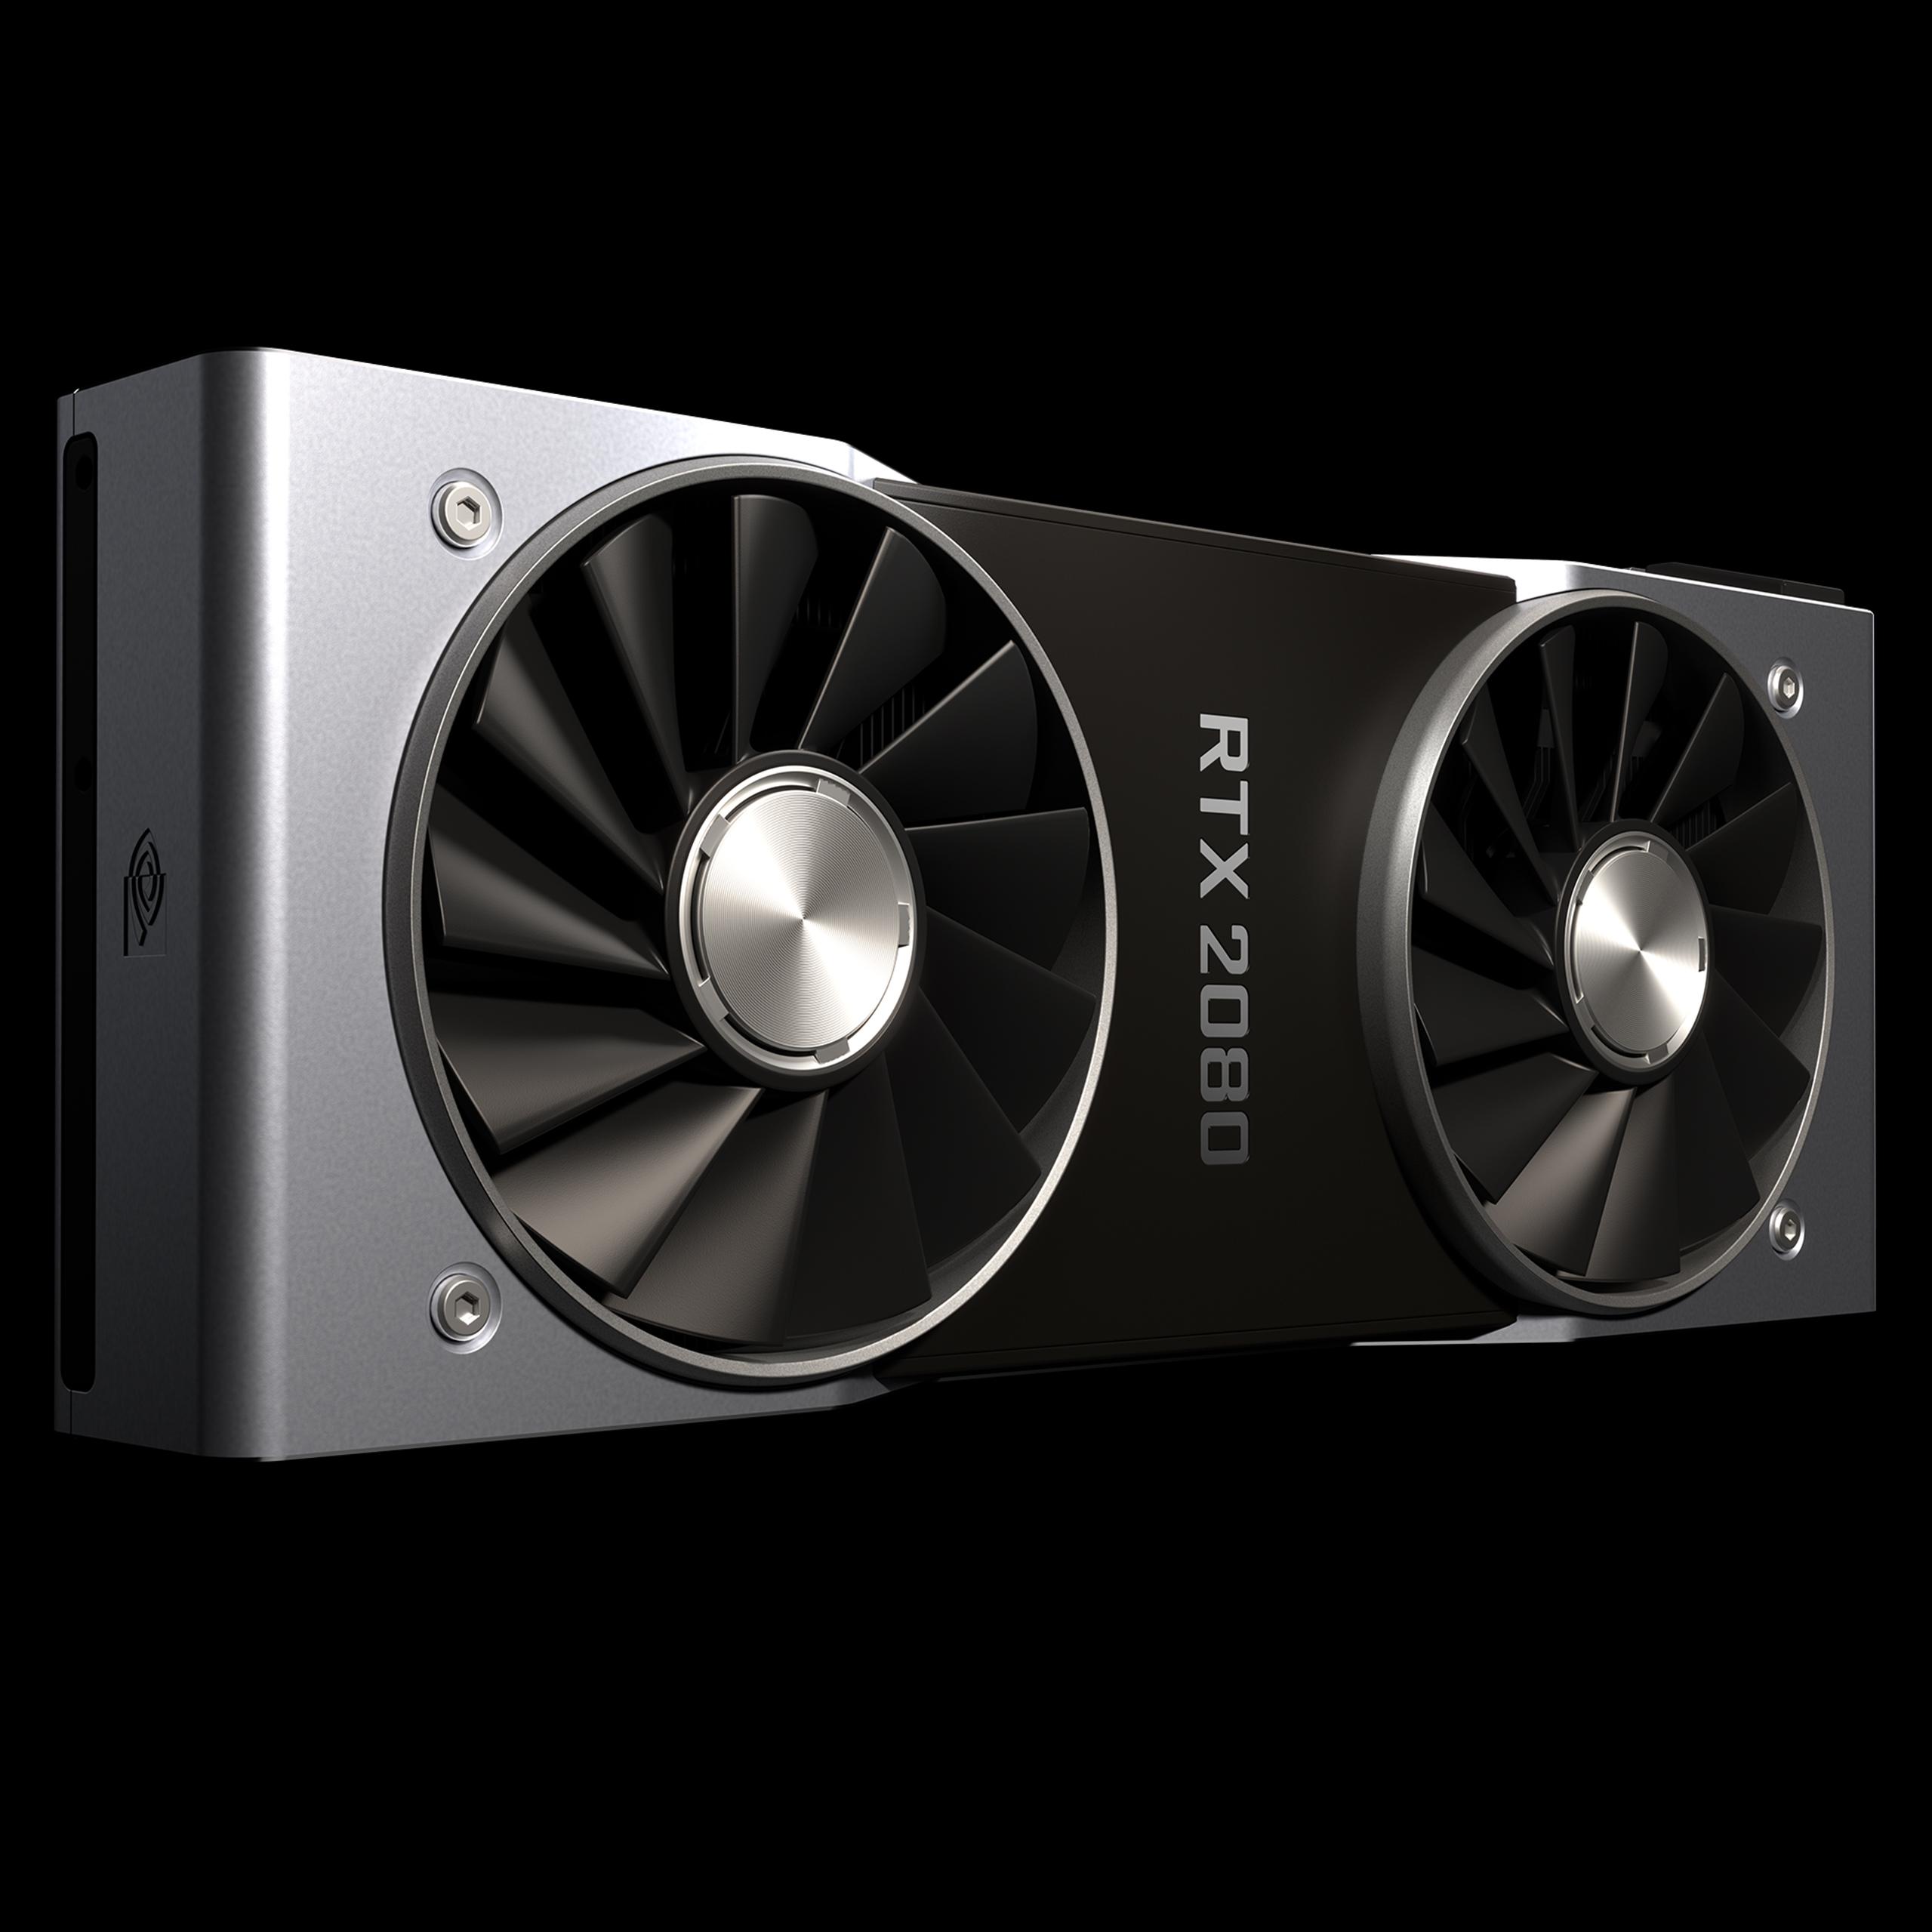 NVIDIA announces GeForce RTX 2080 Ti, RTX 2080 and RTX 2070